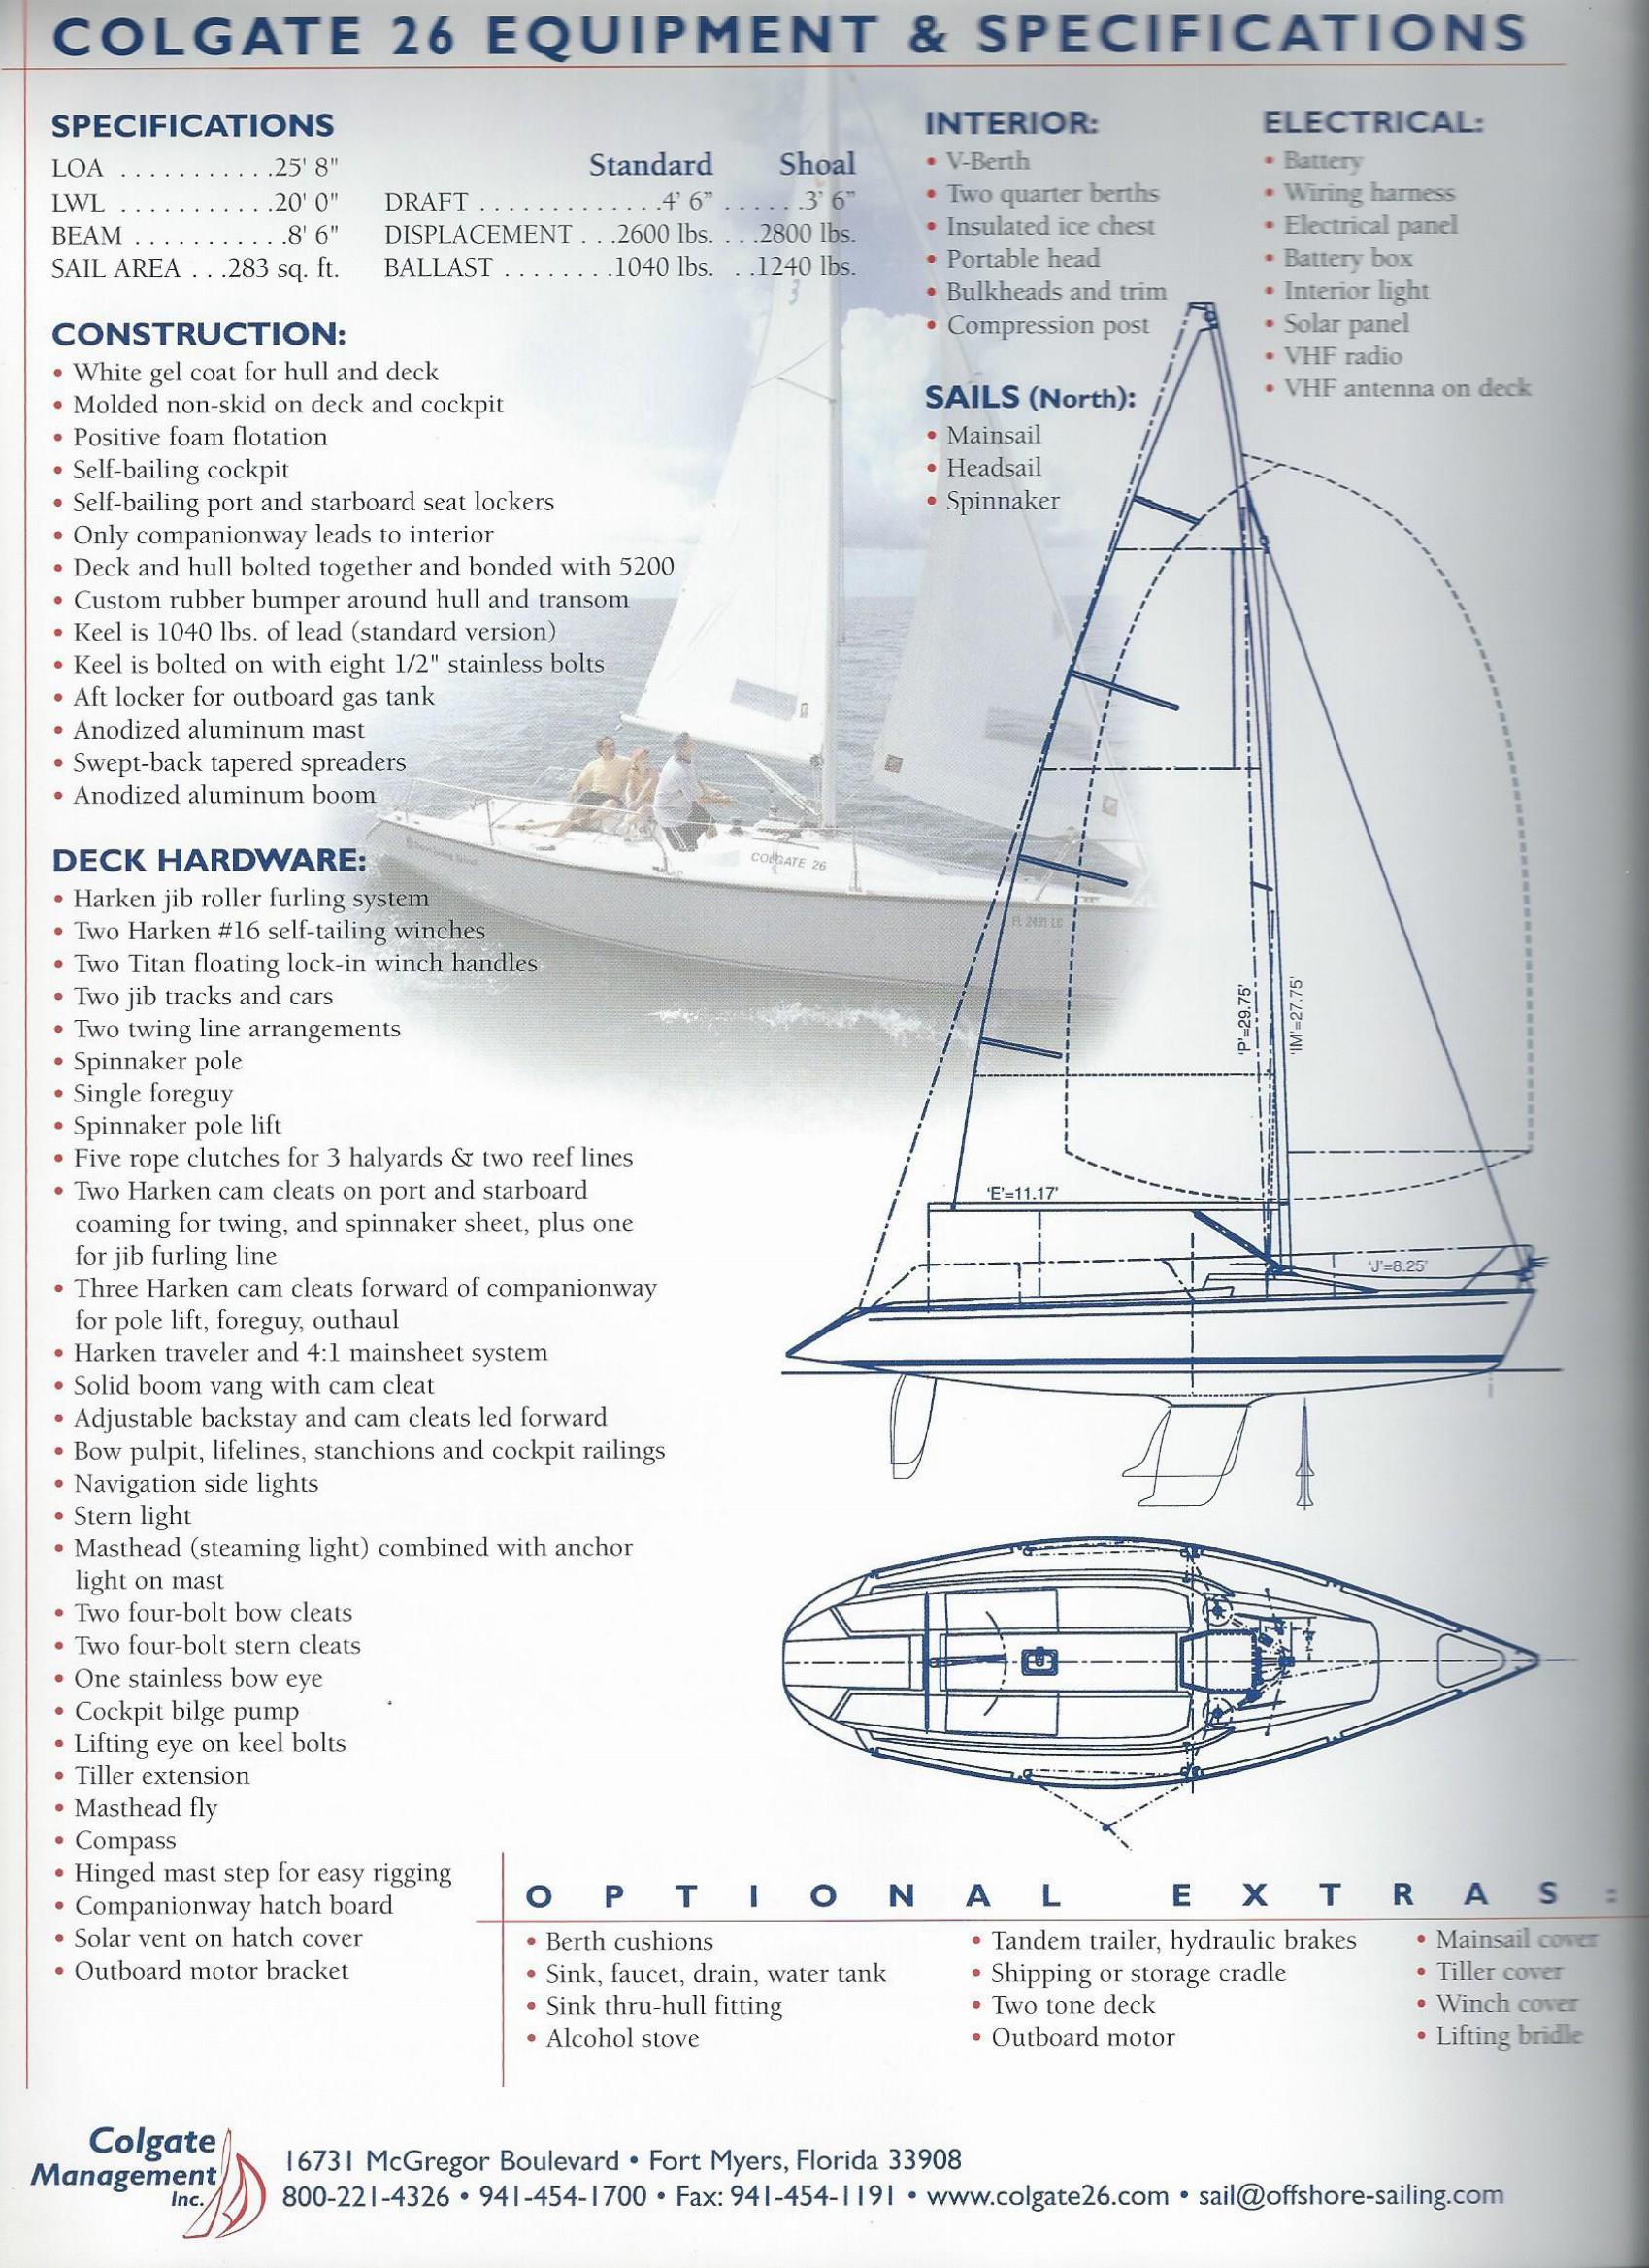 Colgate 26 by Jim Taylor Yacht Designs on 1976 macgregor sailboat, venture newport sailboat, bobcat sailboat, tanzer 25 sailboat, watson 25 sailboat, freedom 21 sailboat, catalina 22 sailboat, ericson 32 sailboat, macgregor 21 sailboat, glen l 25 sailboat, m5 sailboat, macgregor 26x sailboat, santana 21 sailboat, morgan 30 sailboat, venture 24 sailboat, macgregor sailboat modifications, venture 21 sailboat, pdracer sailboat, macgregor 22 sailboat,